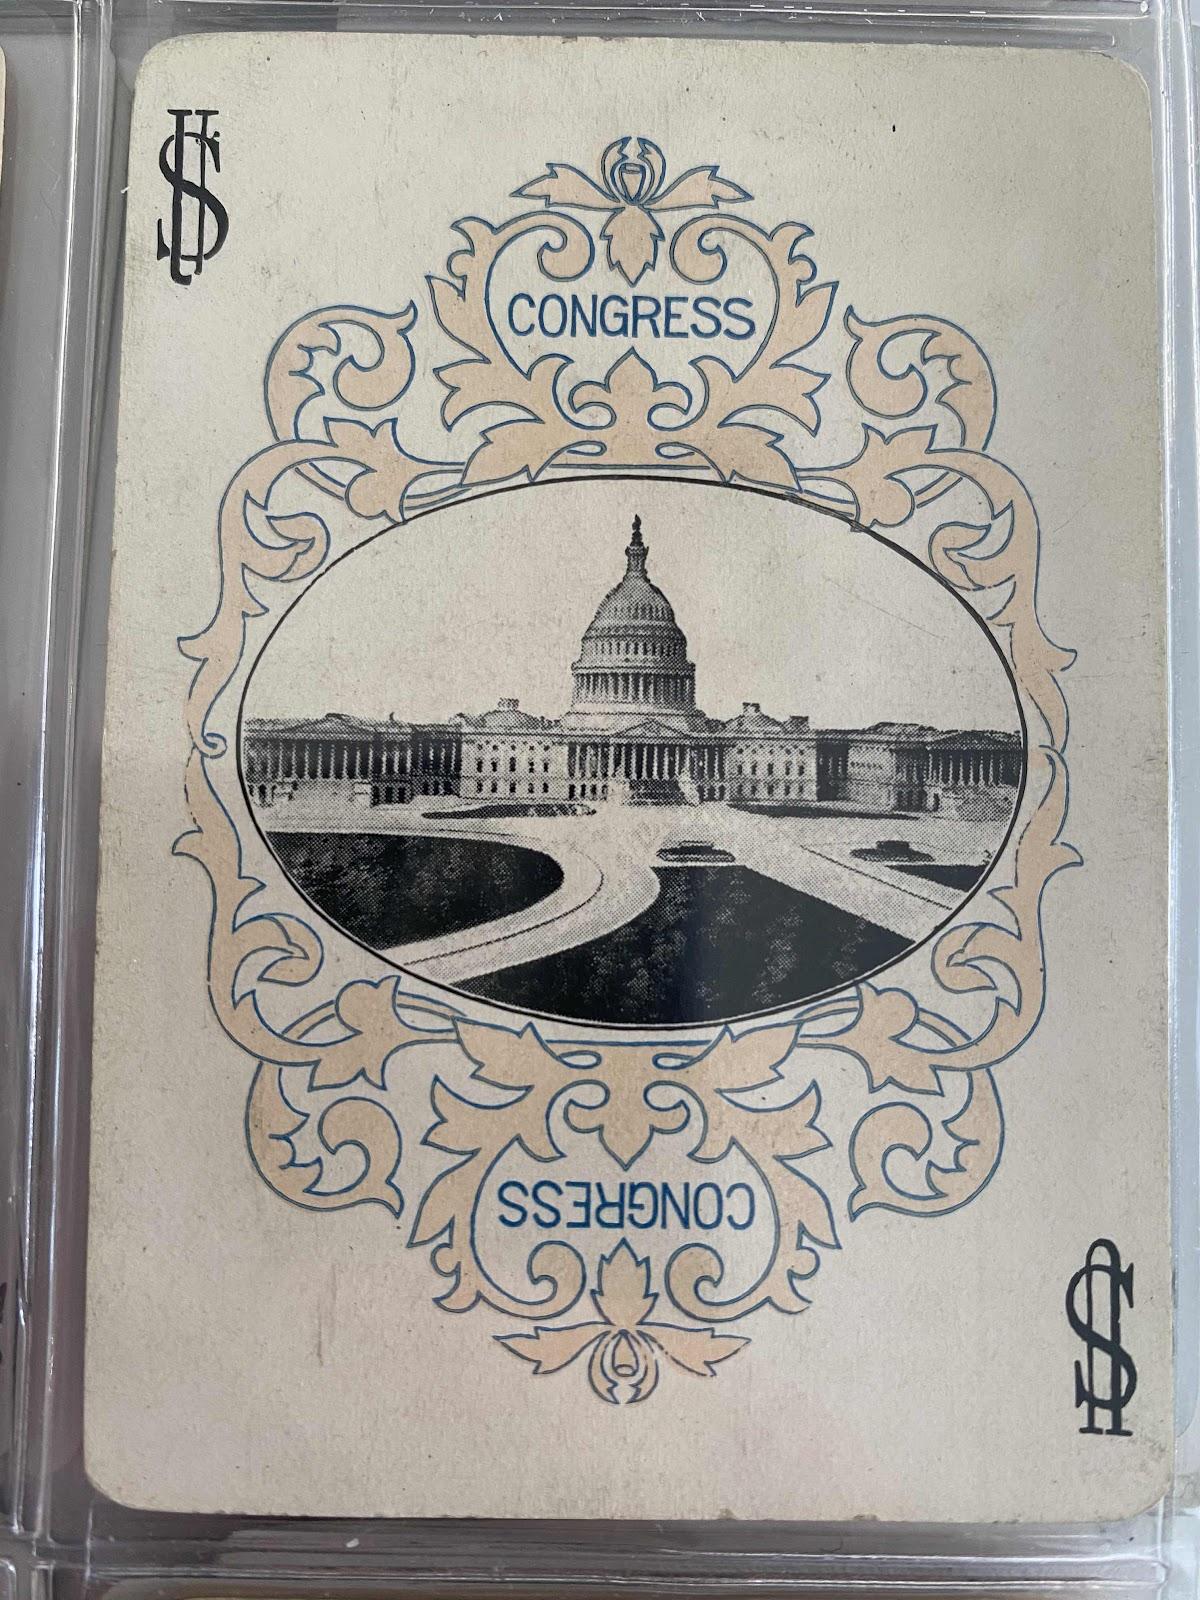 Pink Congress Joker, perhaps from 1895